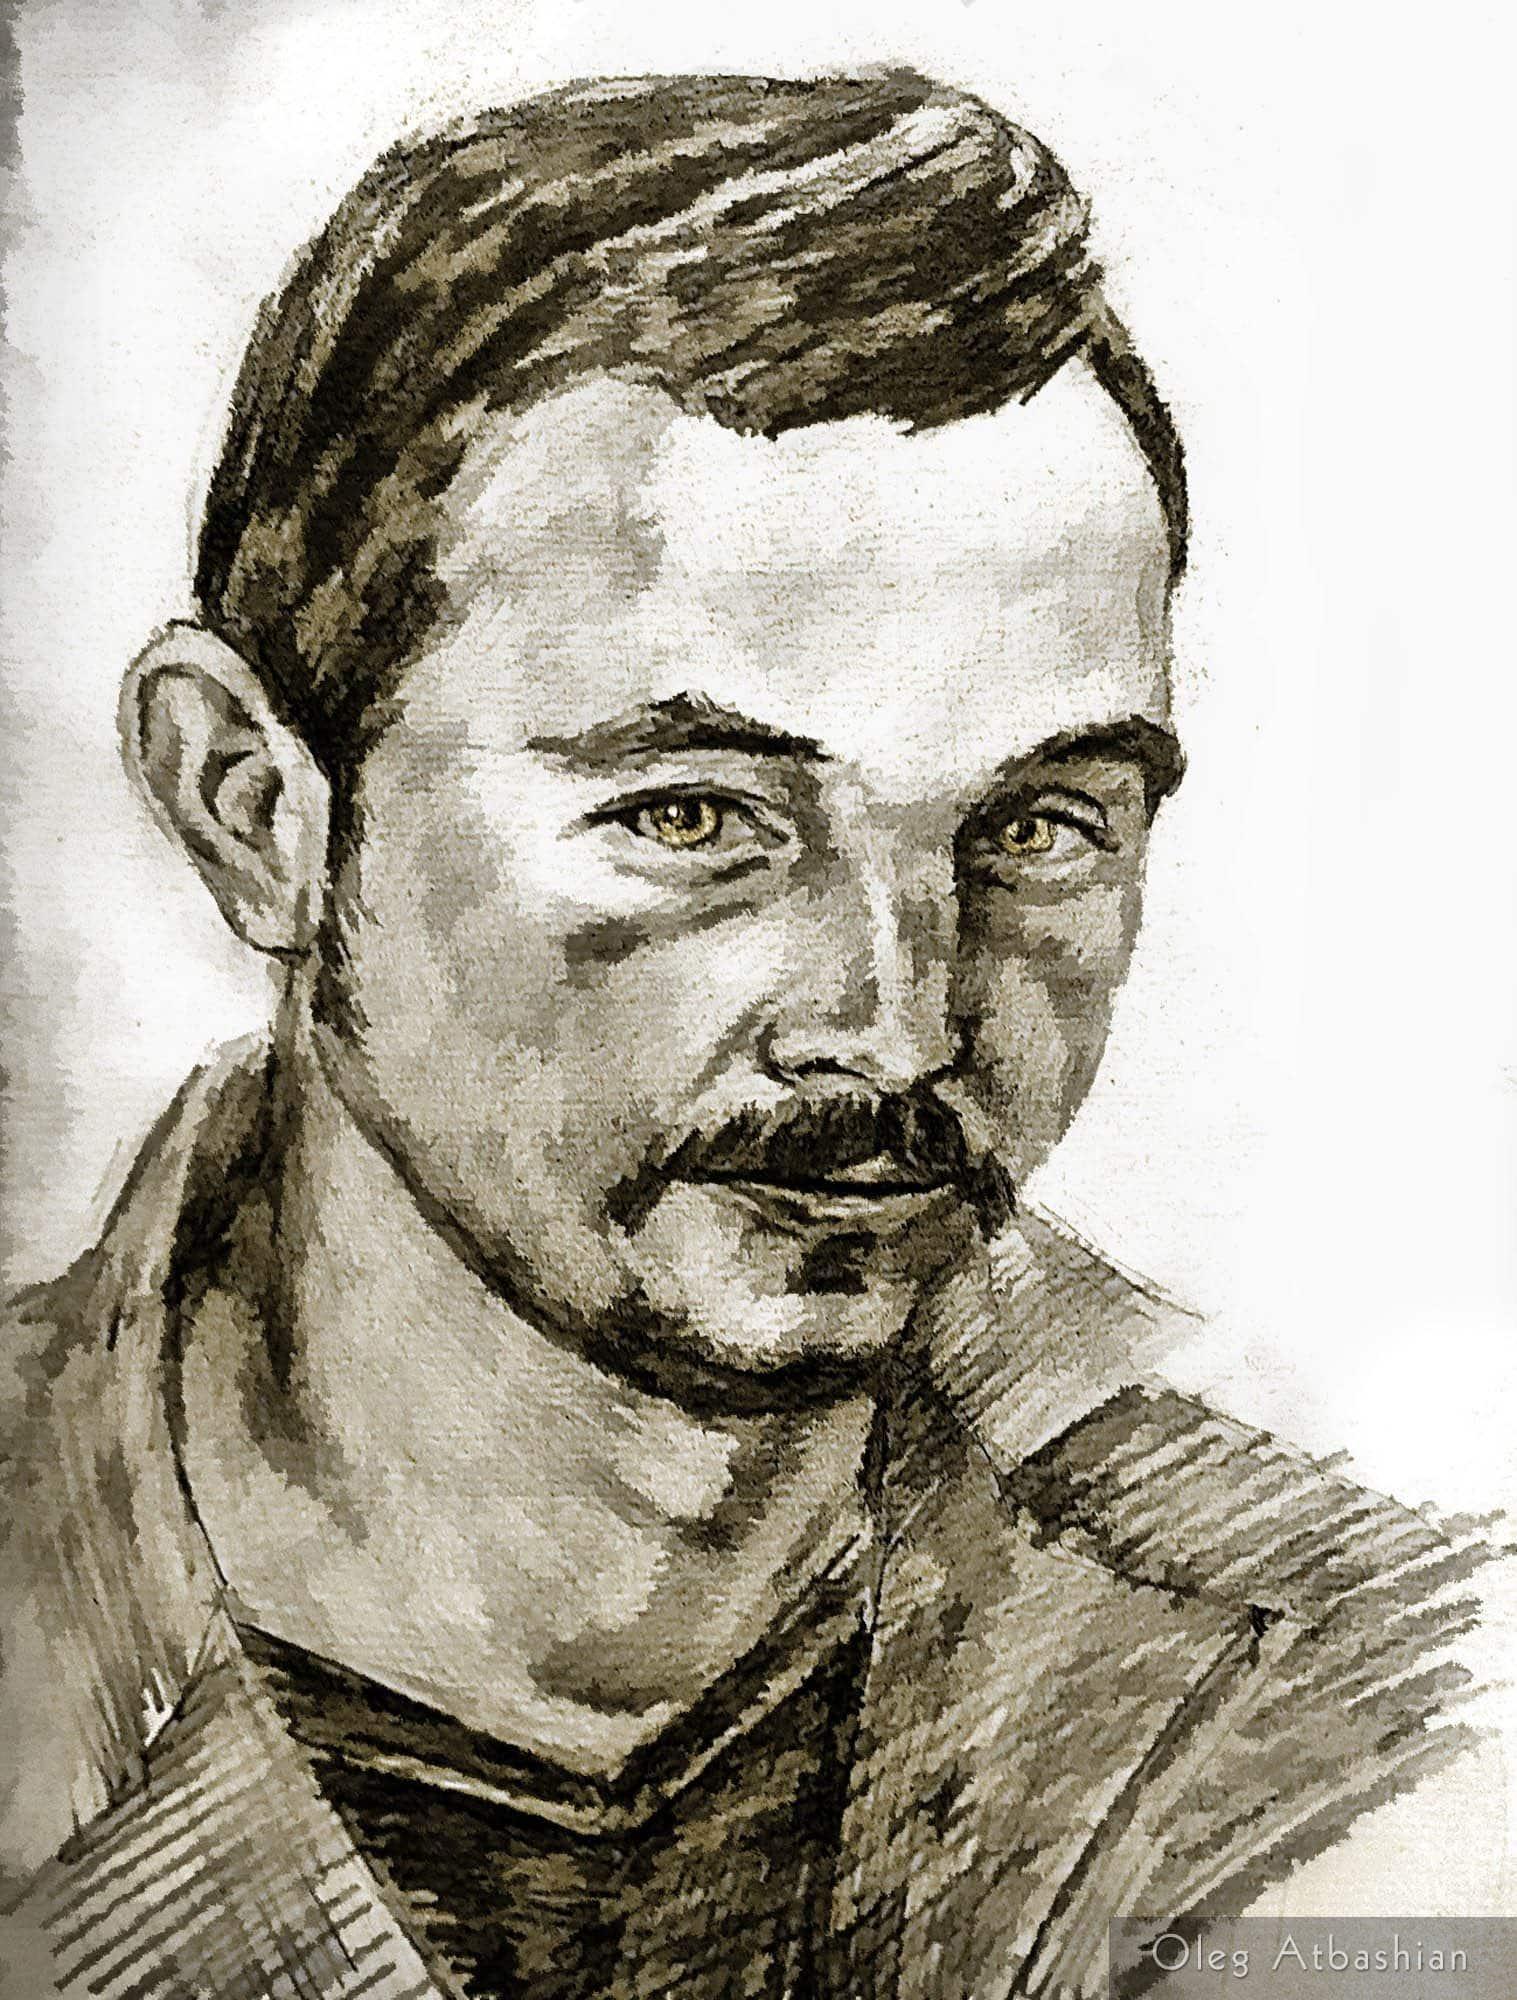 Ukrainian Laborer in Siberia